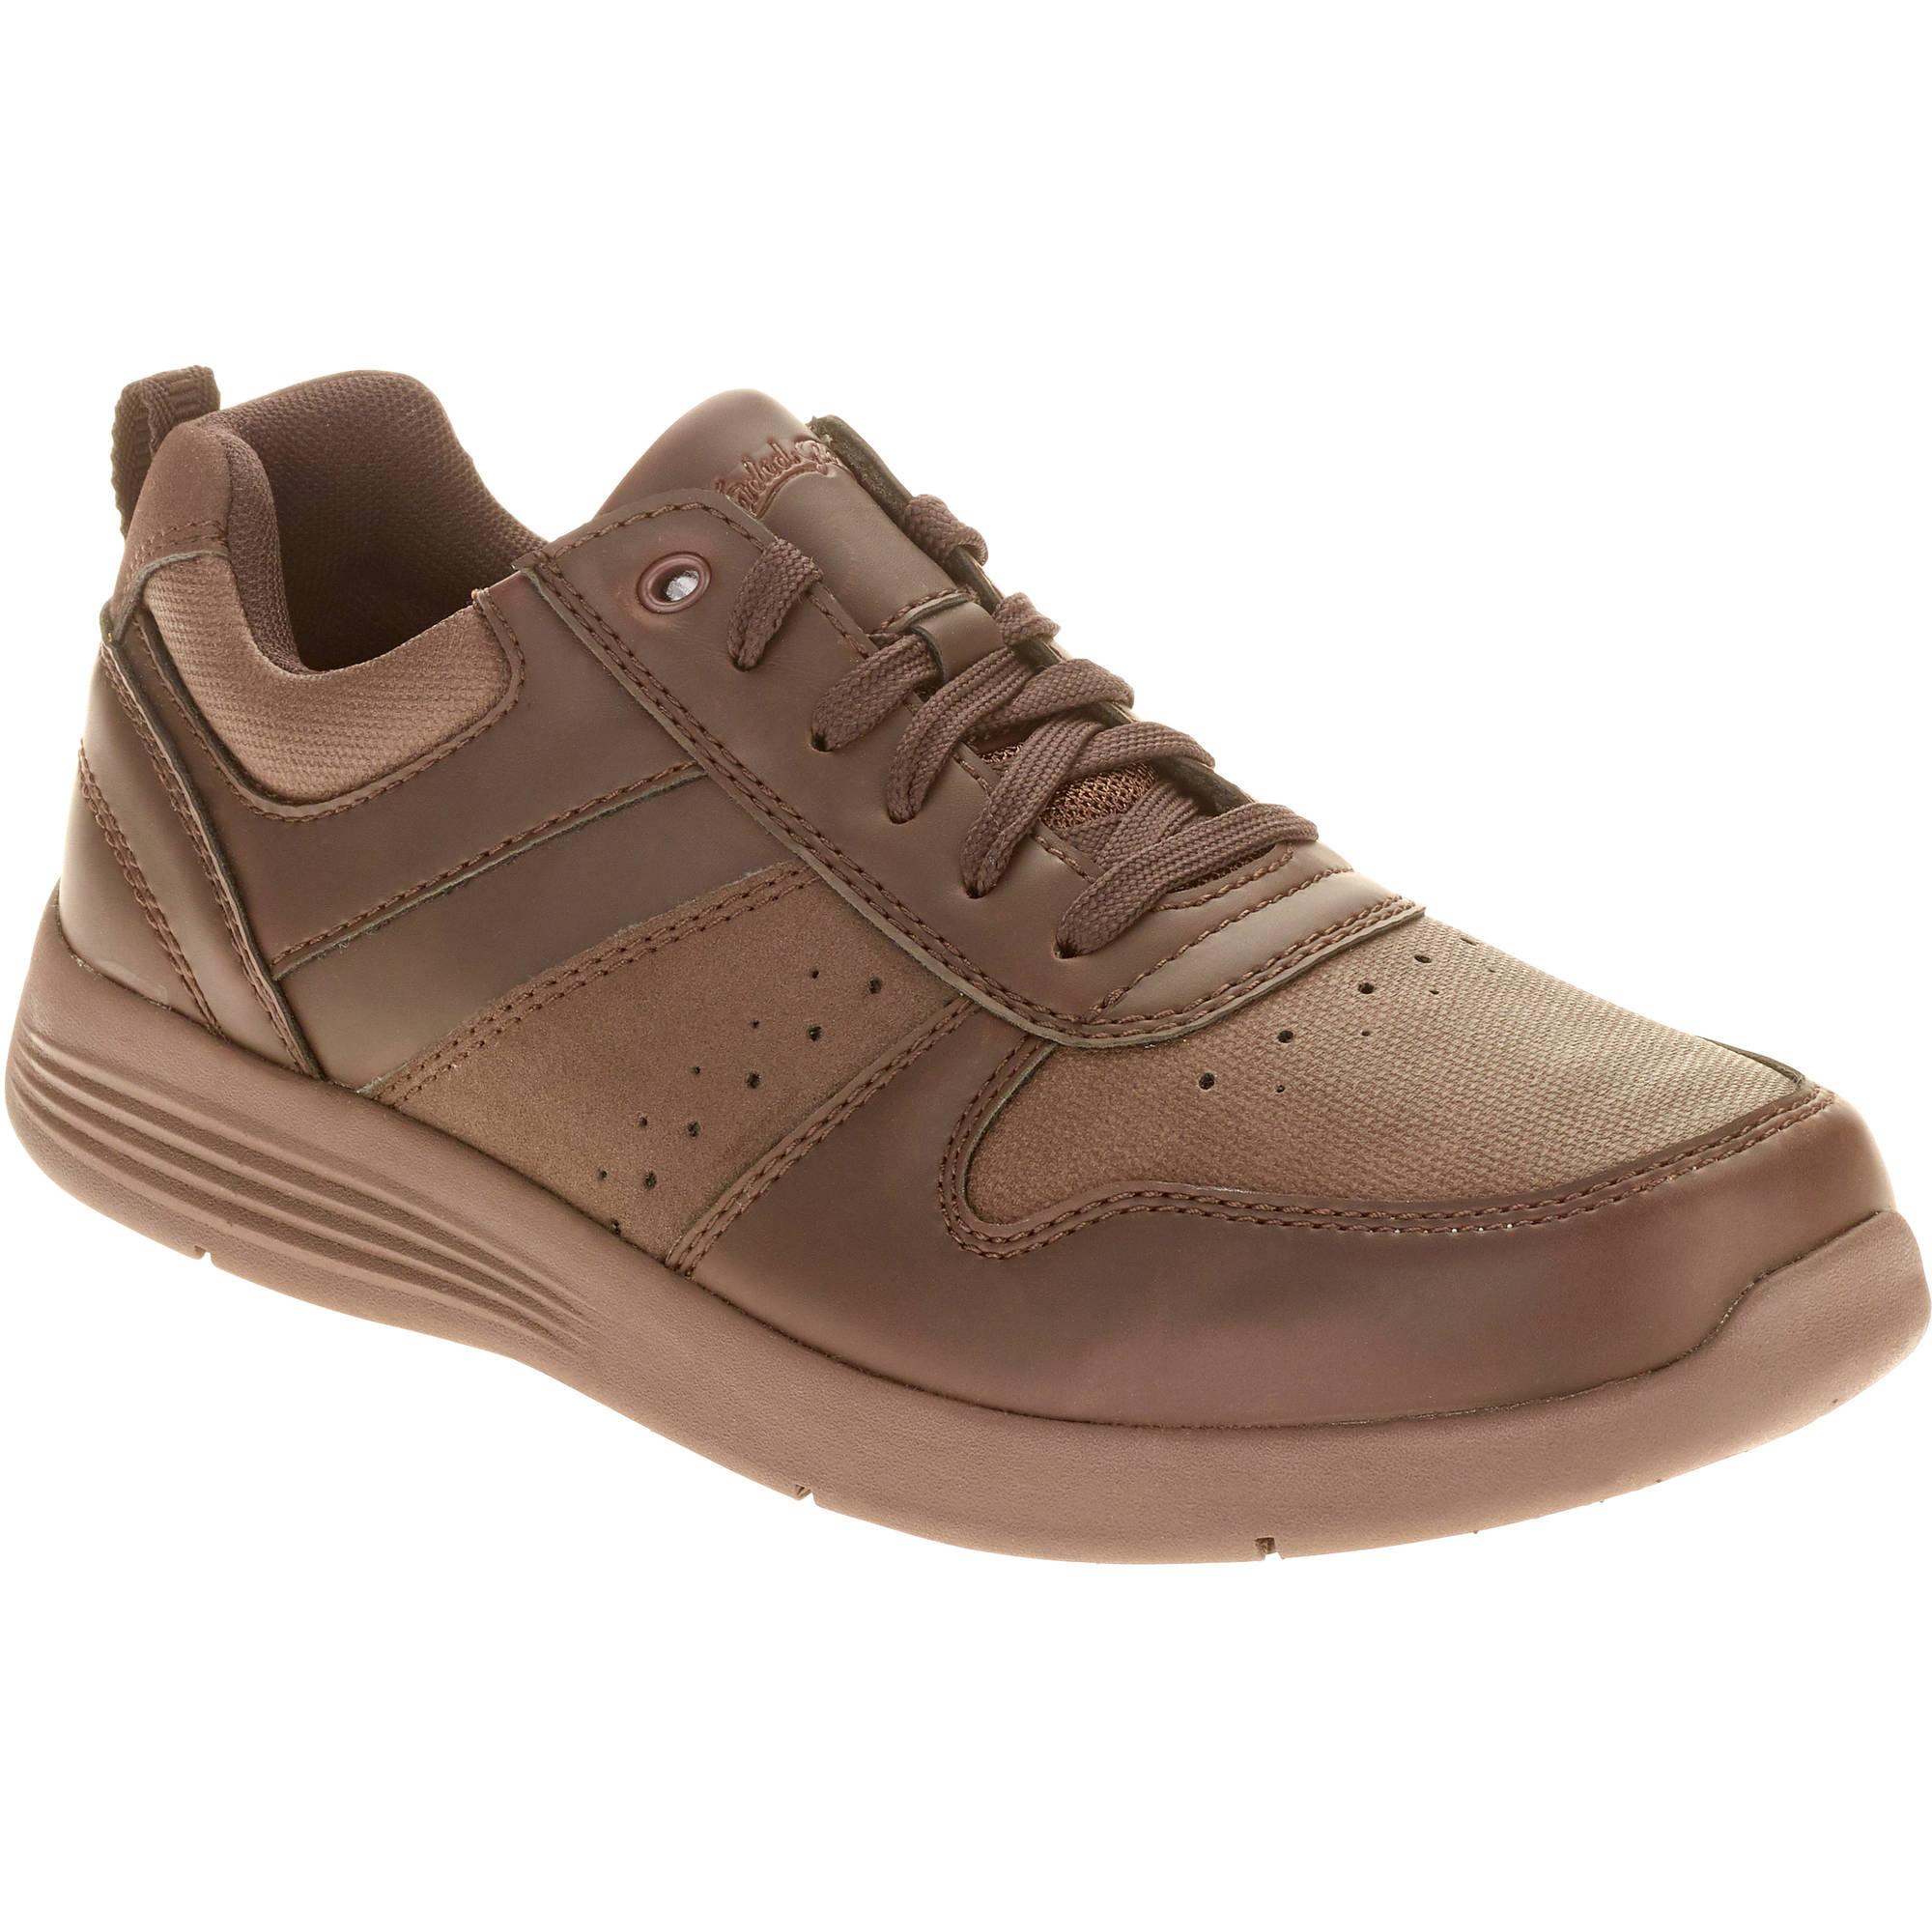 Faded Glory Men's Casual Sport Shoe by